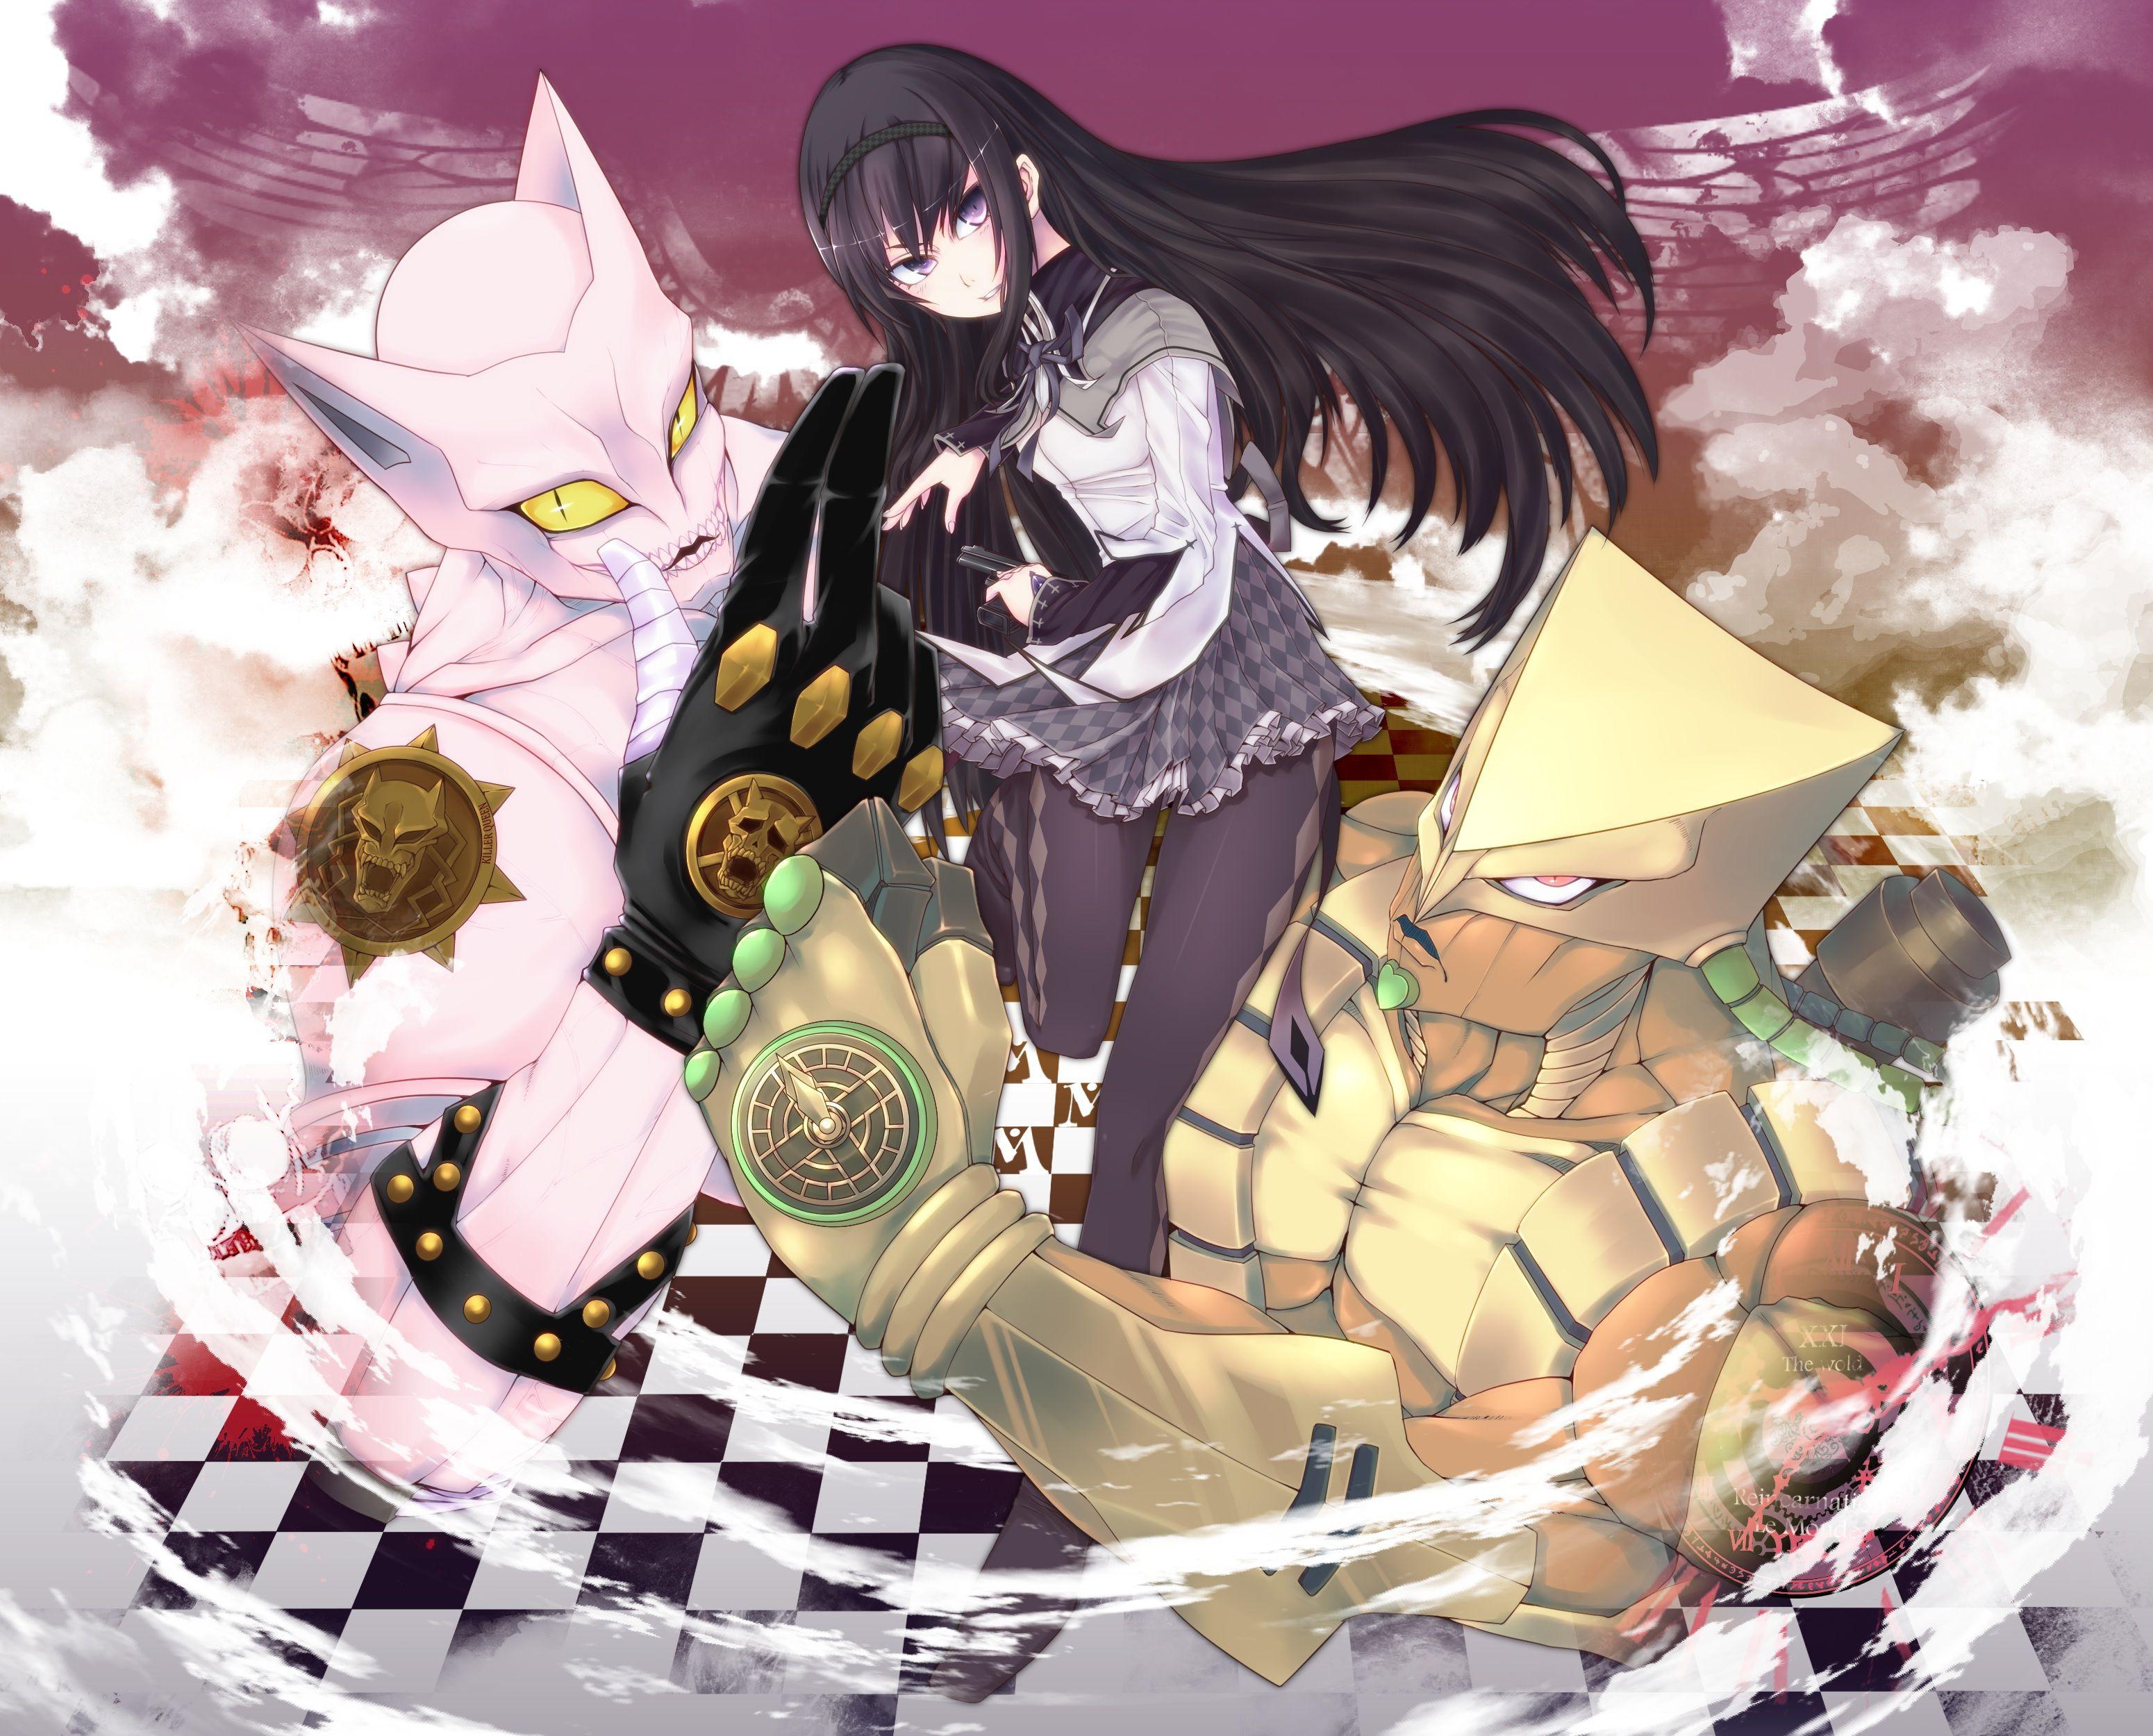 Killer Queen Jojo Wallpaper Pc - Game digital wallpaper ...